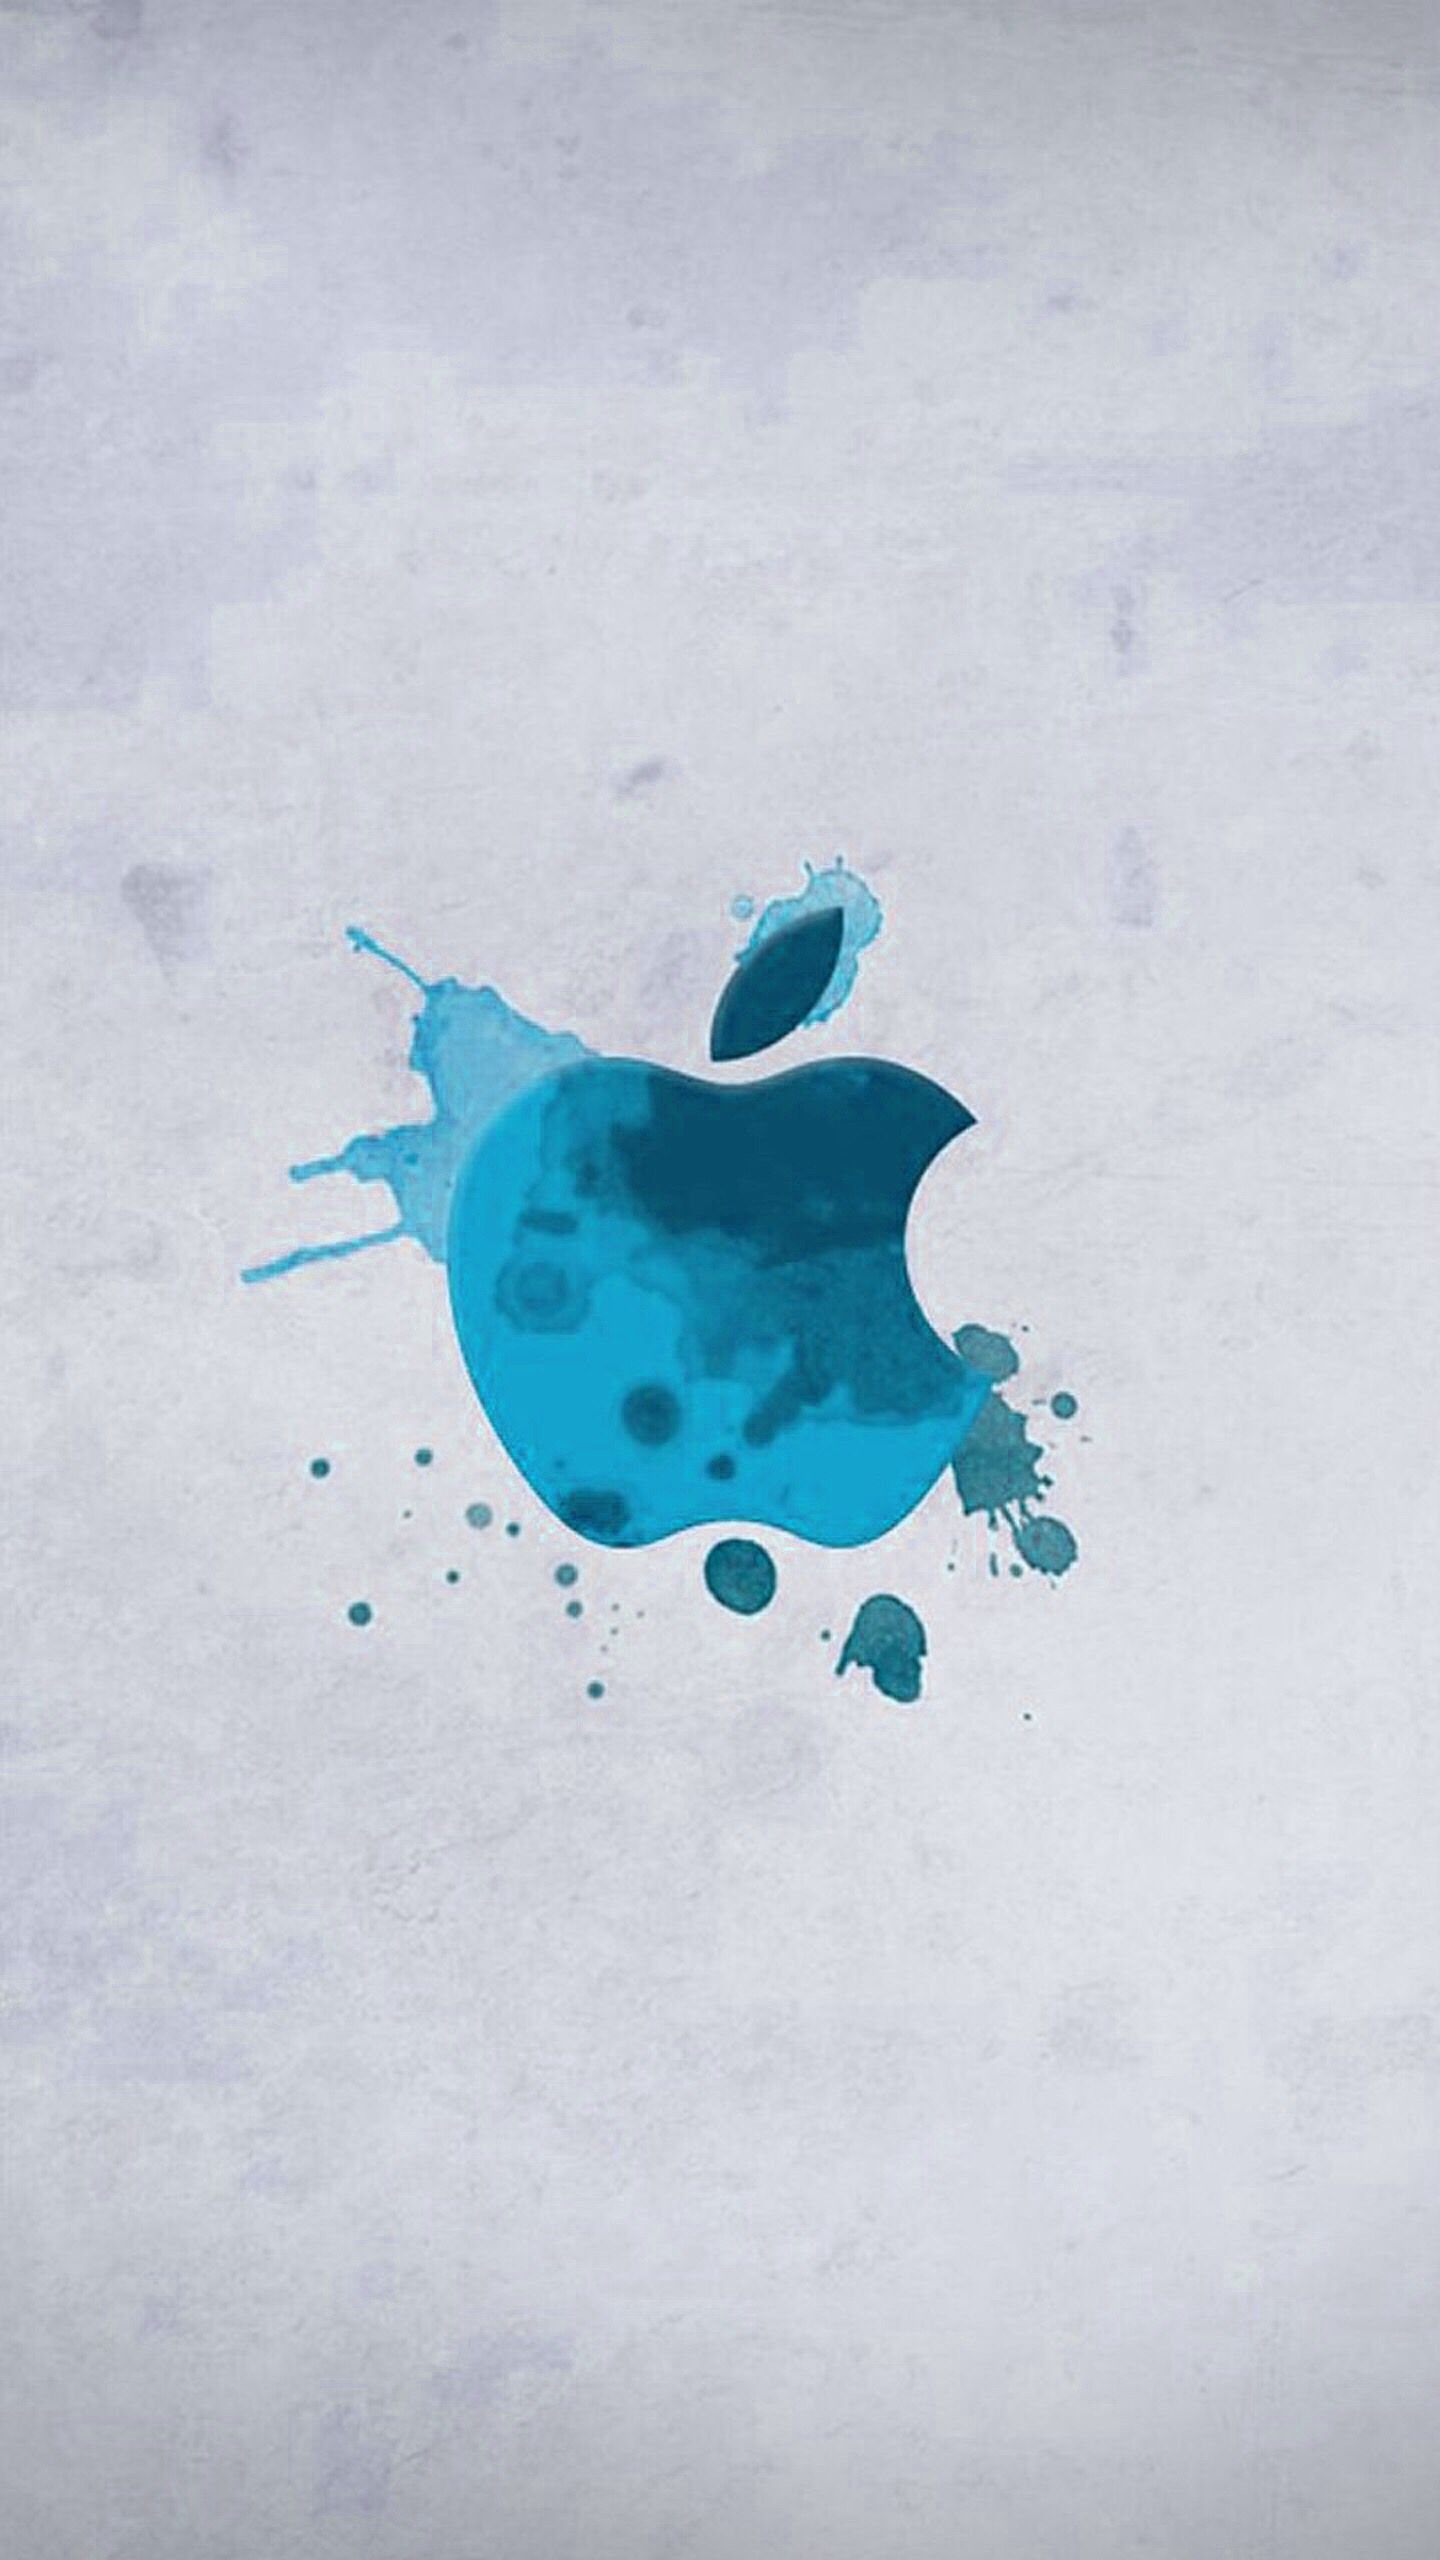 Blue Aqua Light Logo Abstract Apple Wallpaper Iphone Clean Beauty Colour Ios Min Apple Logo Wallpaper Iphone Apple Wallpaper Iphone Grape Wallpaper